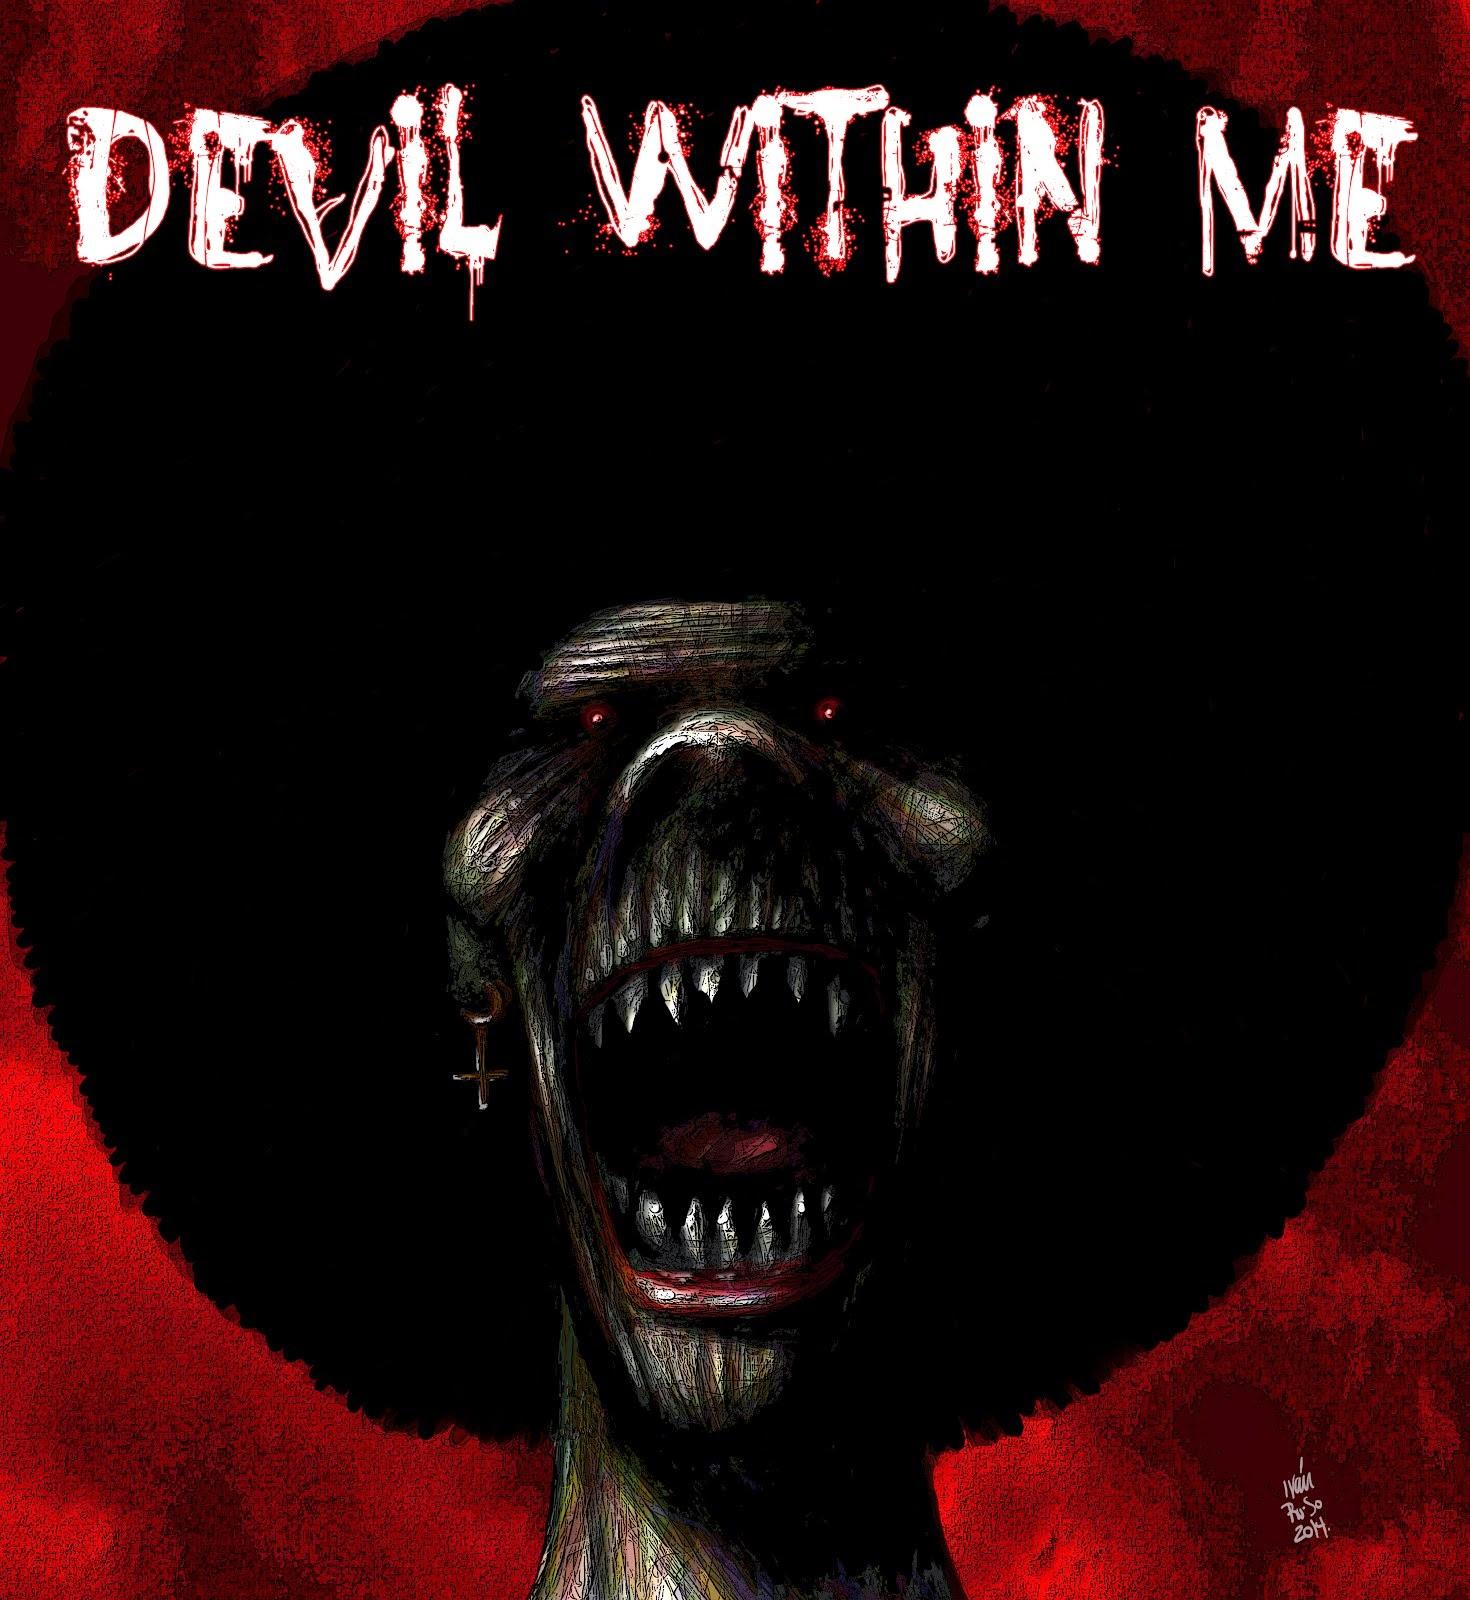 Devil within me